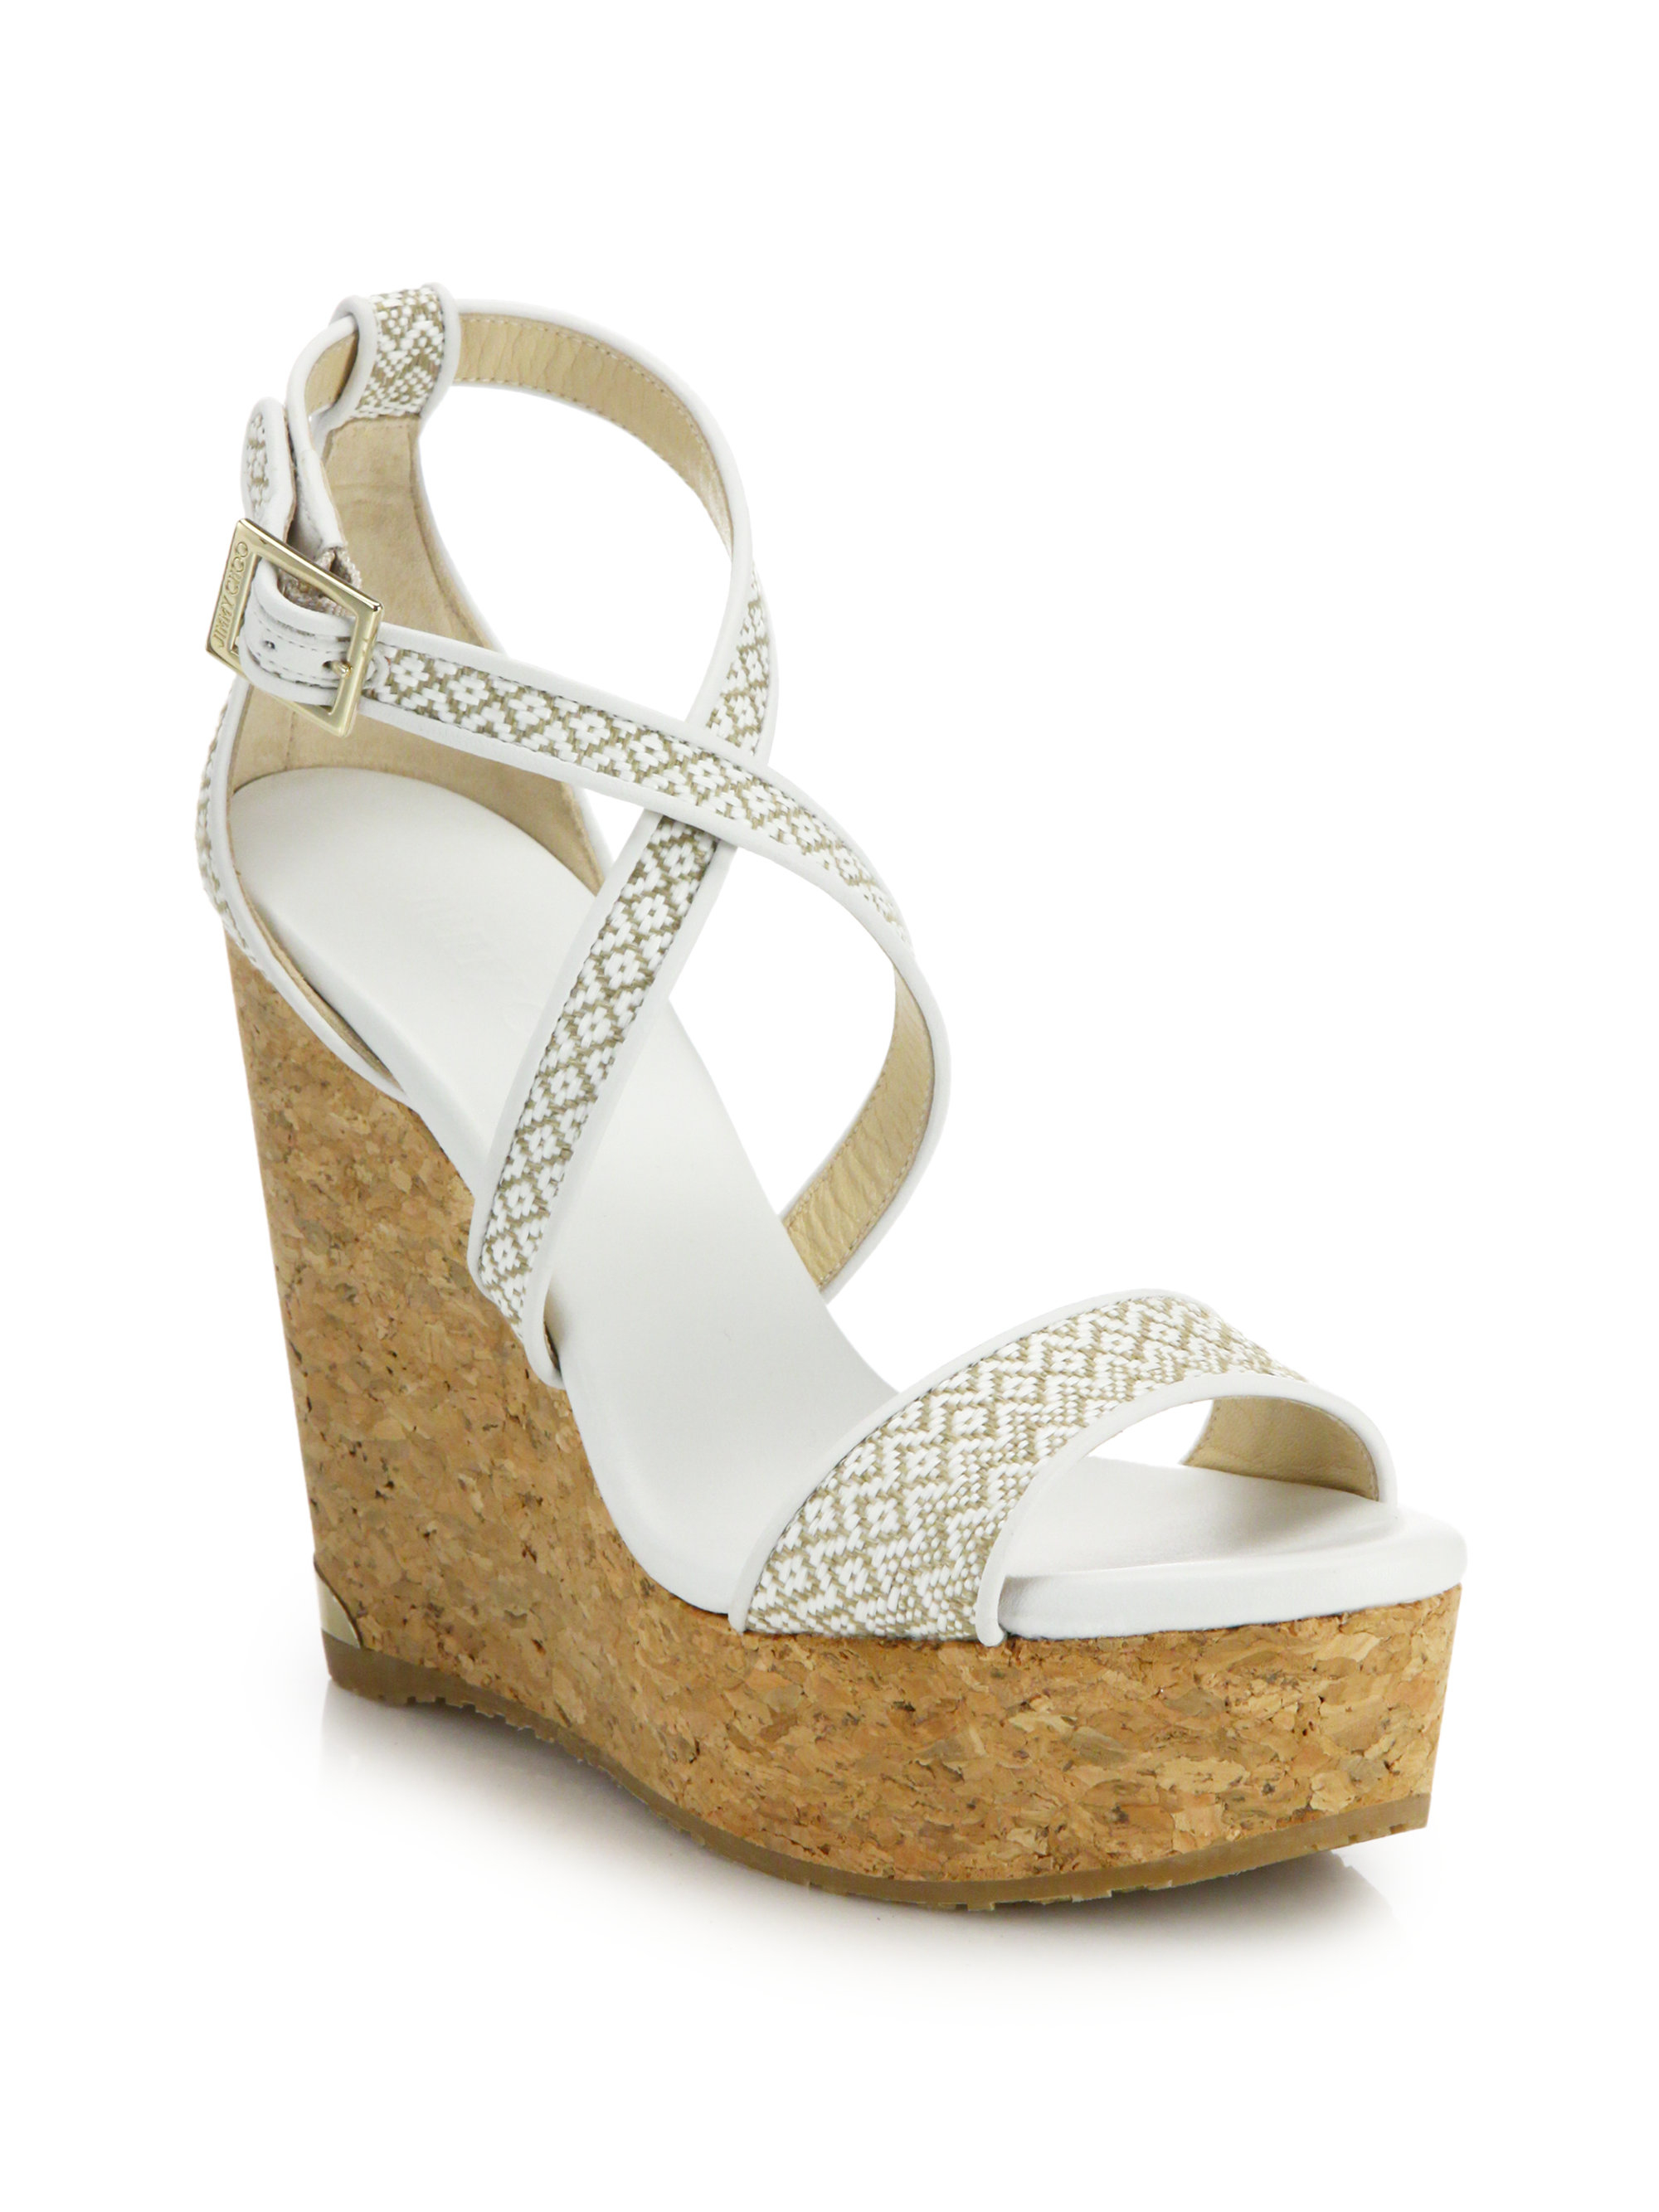 318567fa1b04 Lyst - Jimmy Choo Portia Woven Fabric   Cork Platform Wedge Sandals ...